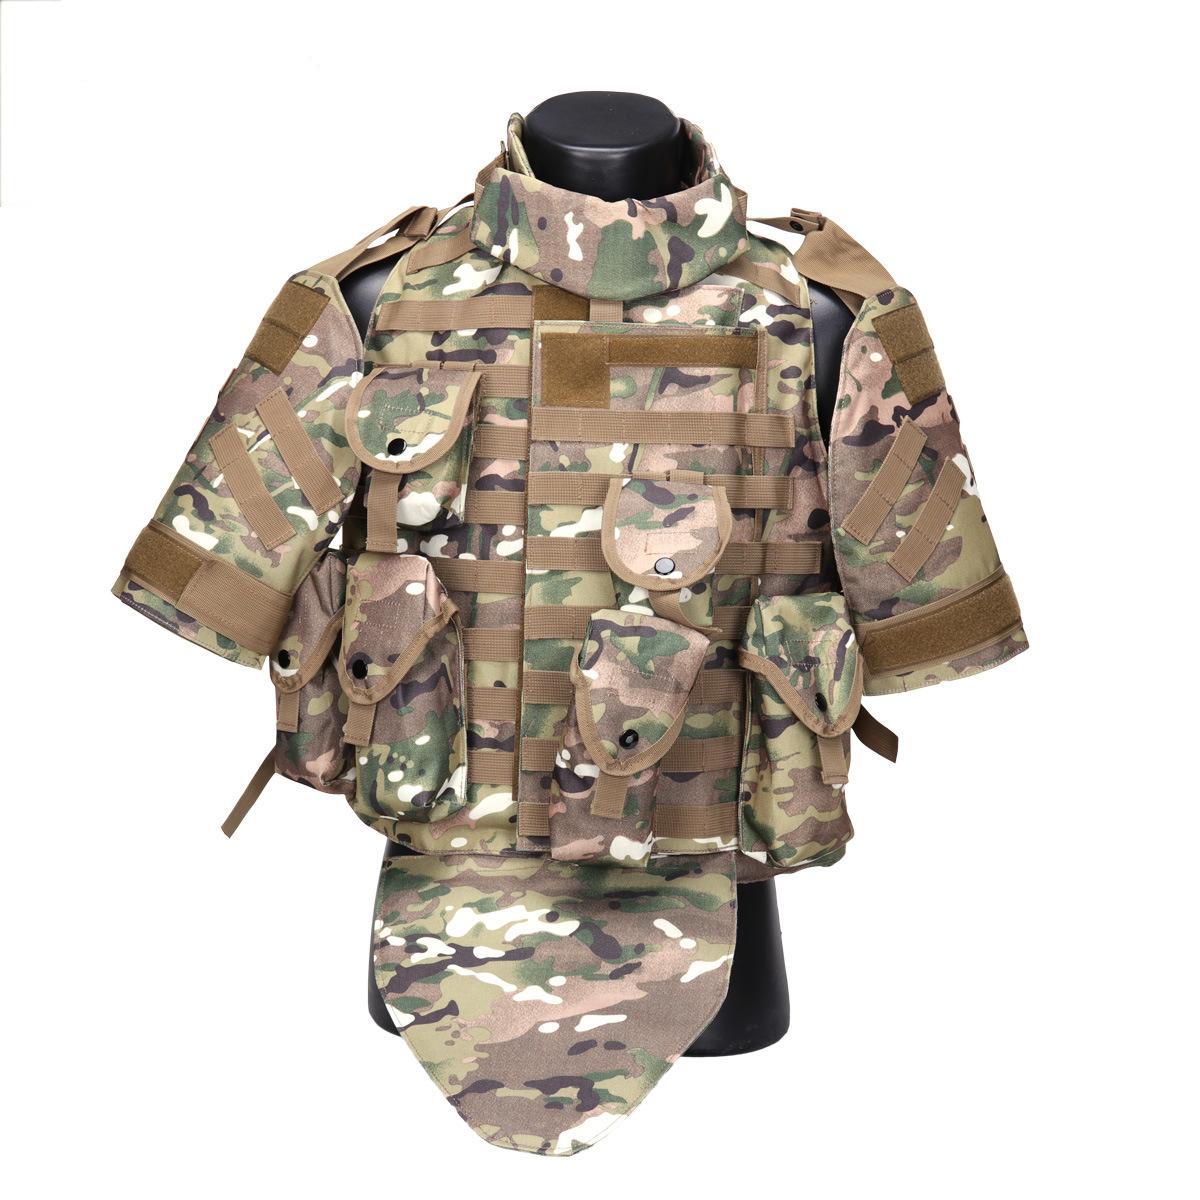 OTV Tactical Vest Tarnung Body Armor Kampfweste mit Beutel / Pad USMC Airsoft Armee Molle Angriffs-Platten-Fördermaschine CS Kleidung